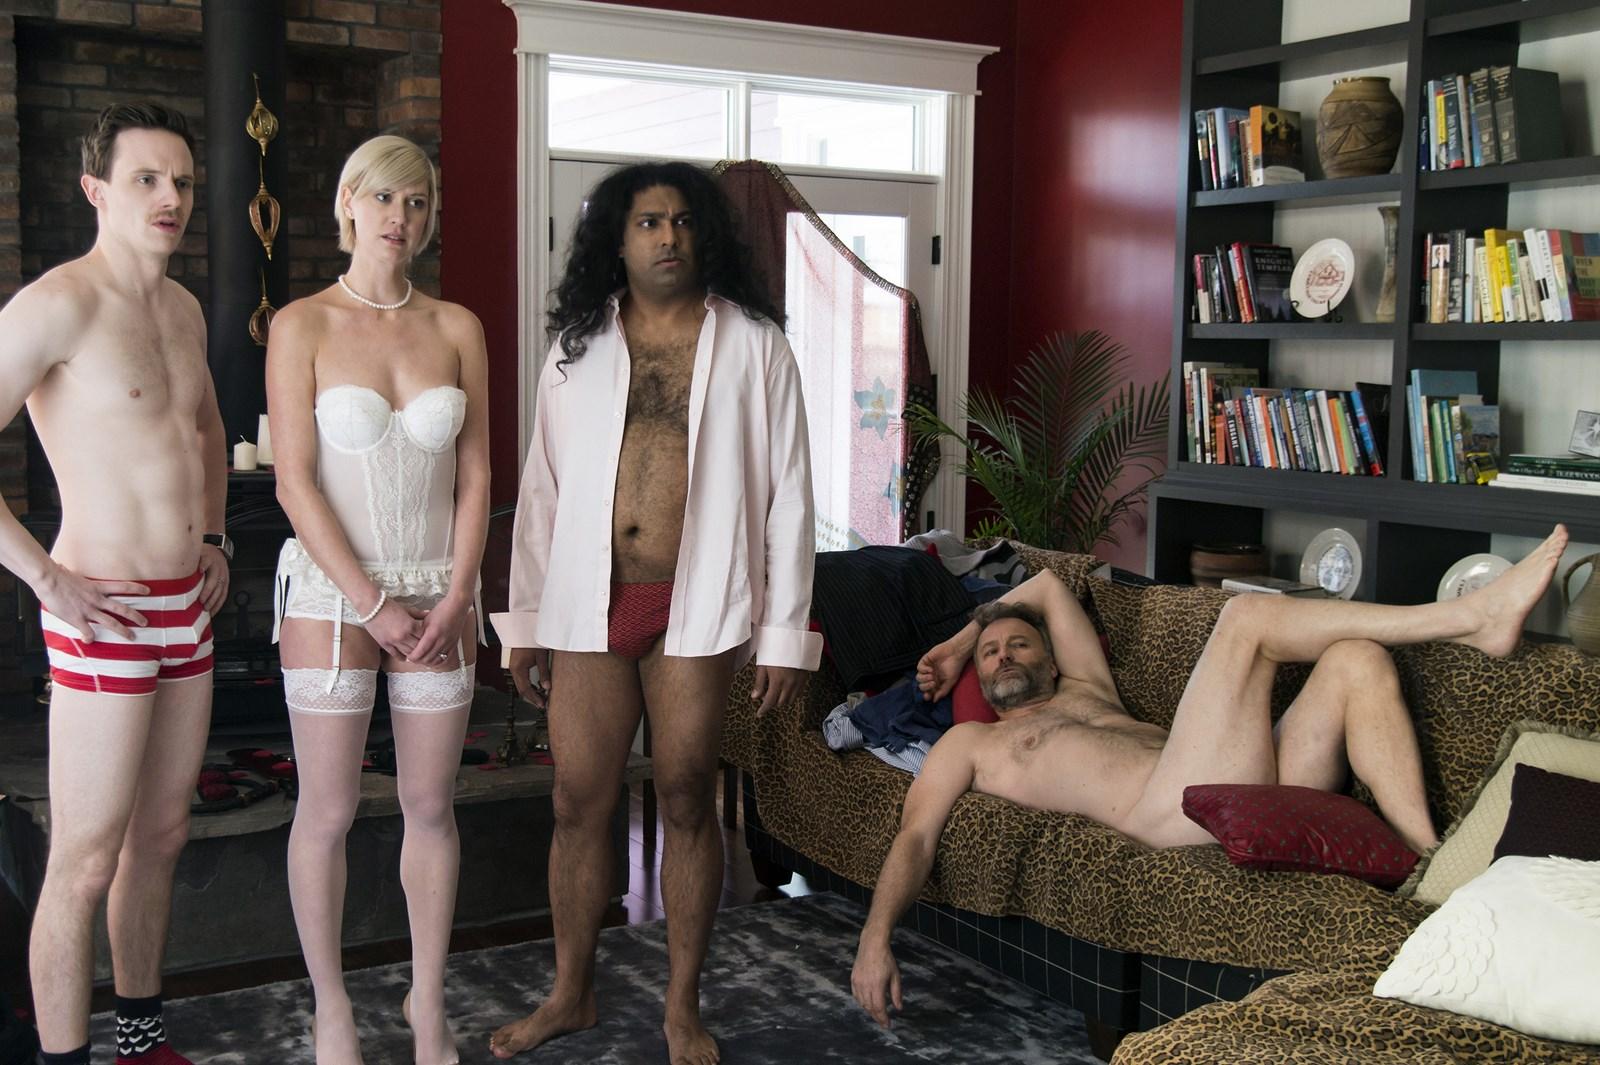 Fat lesbians naked